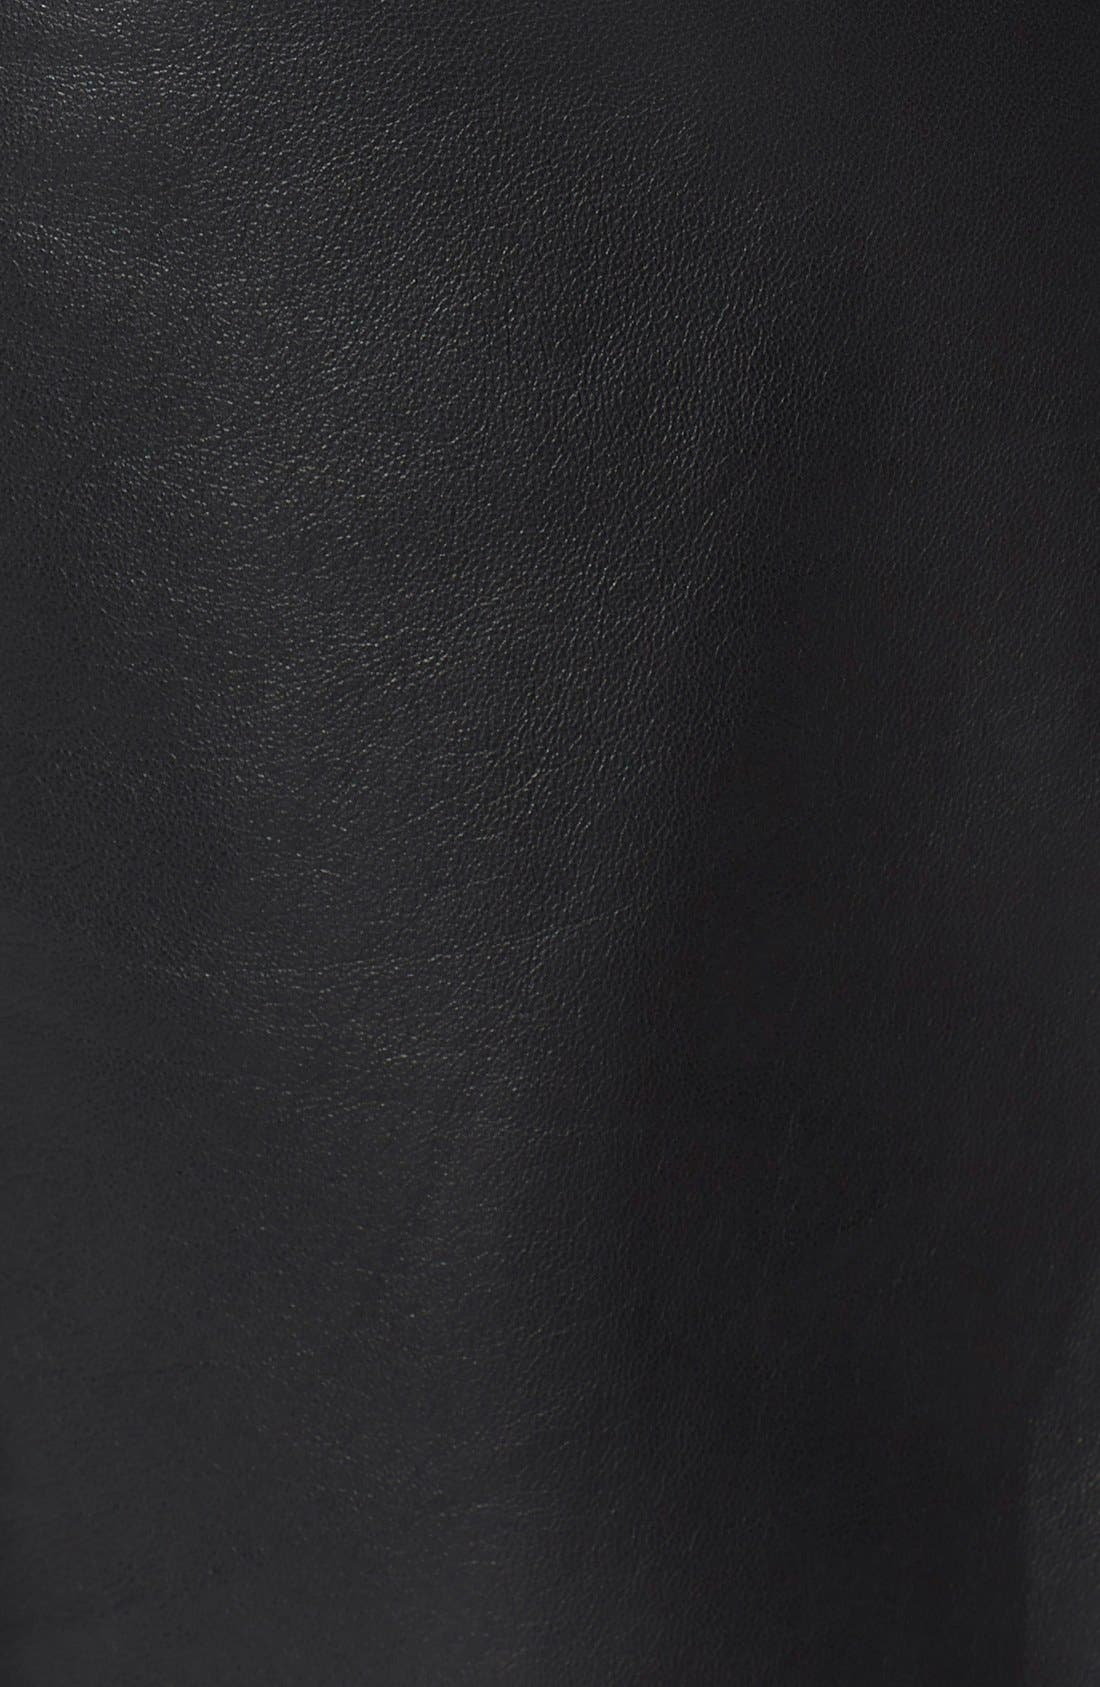 Alternate Image 3  - Helmut Lang Crop Leather Pants